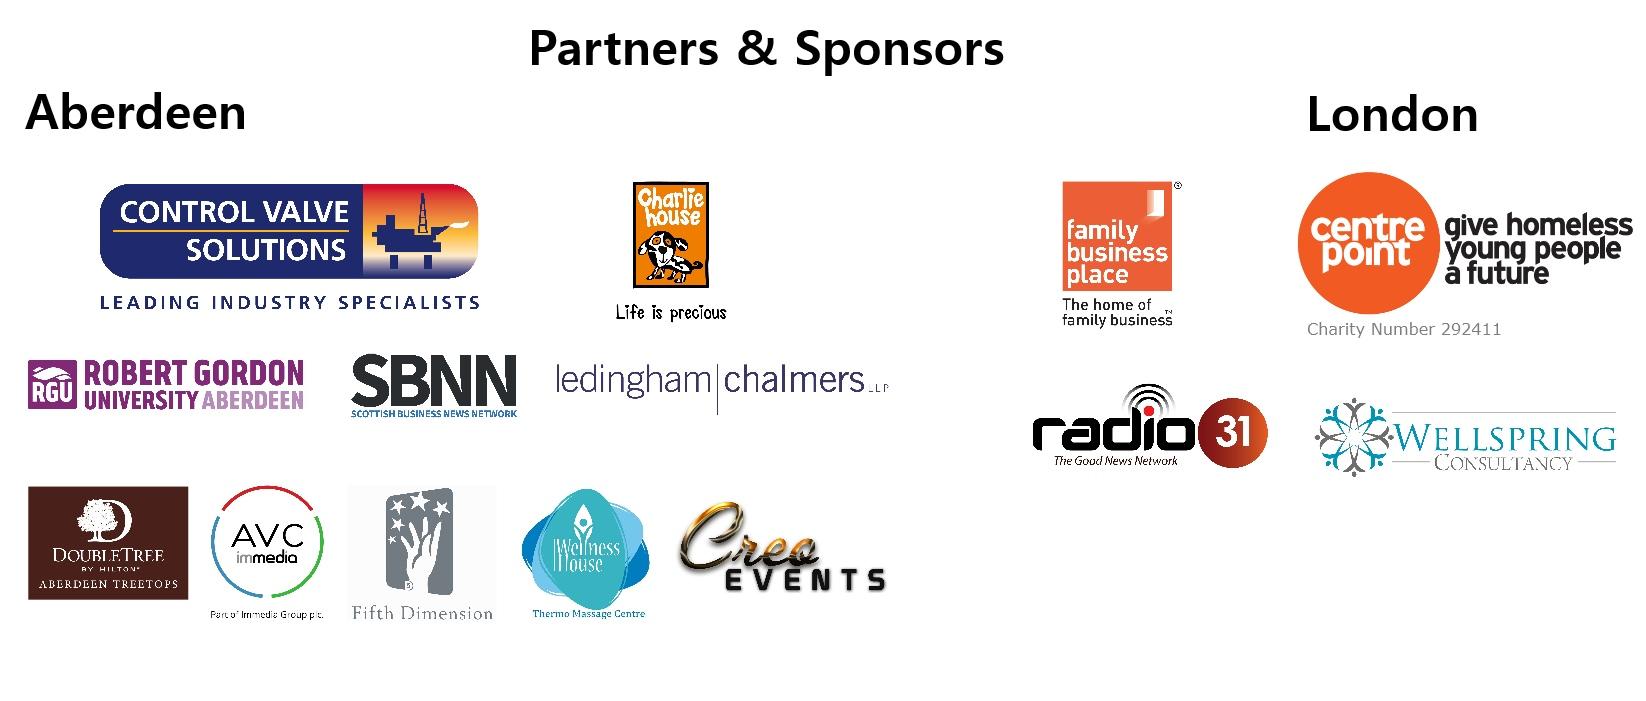 2018 Partners & Sponsors